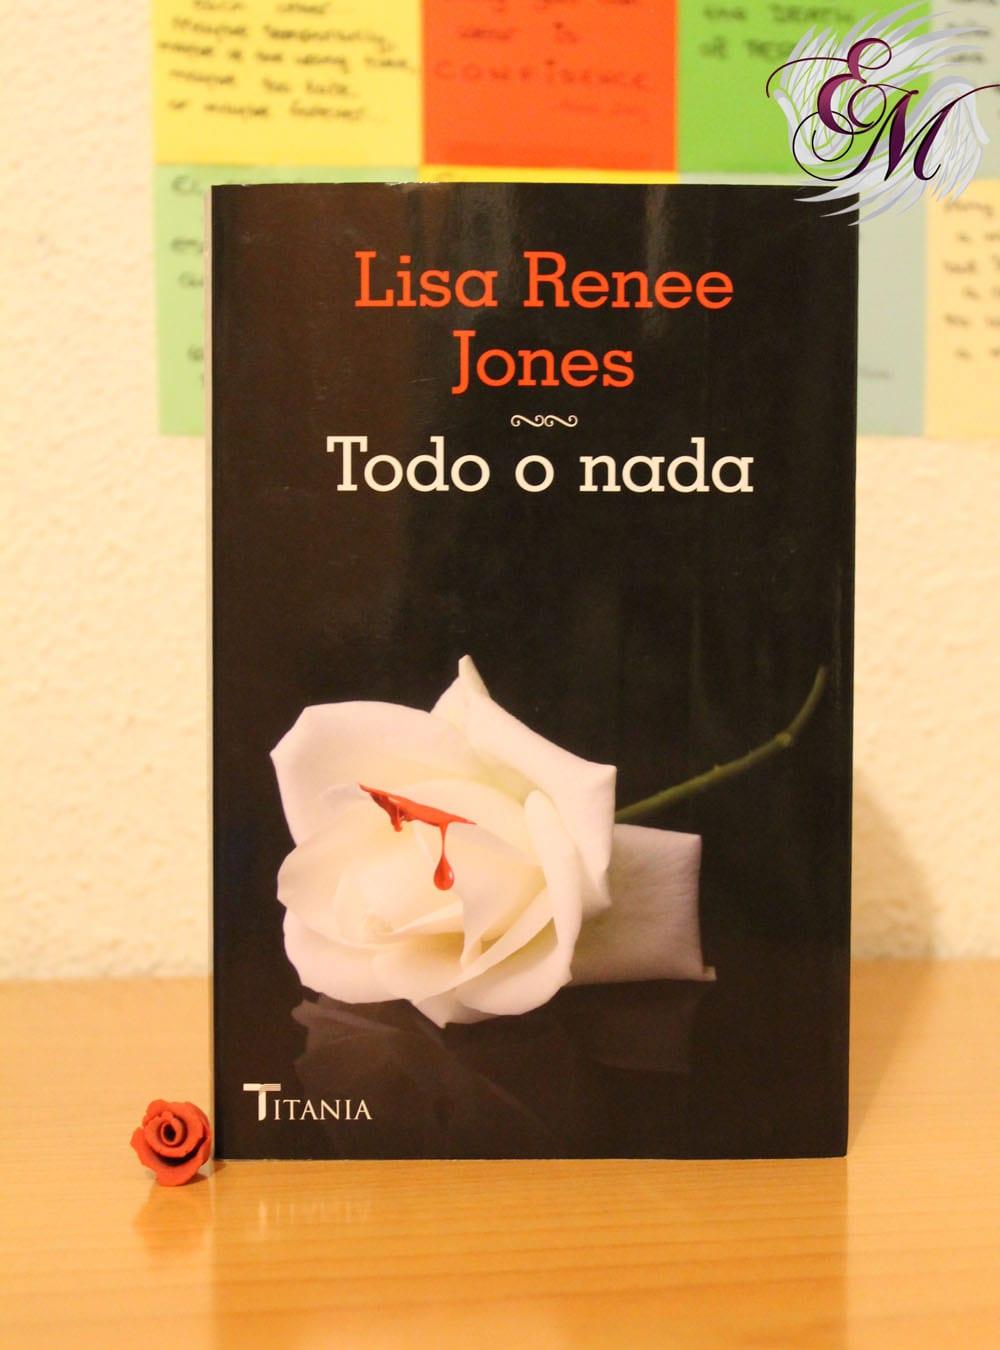 Todo o nada, Lisa Renee Jones - Reseña